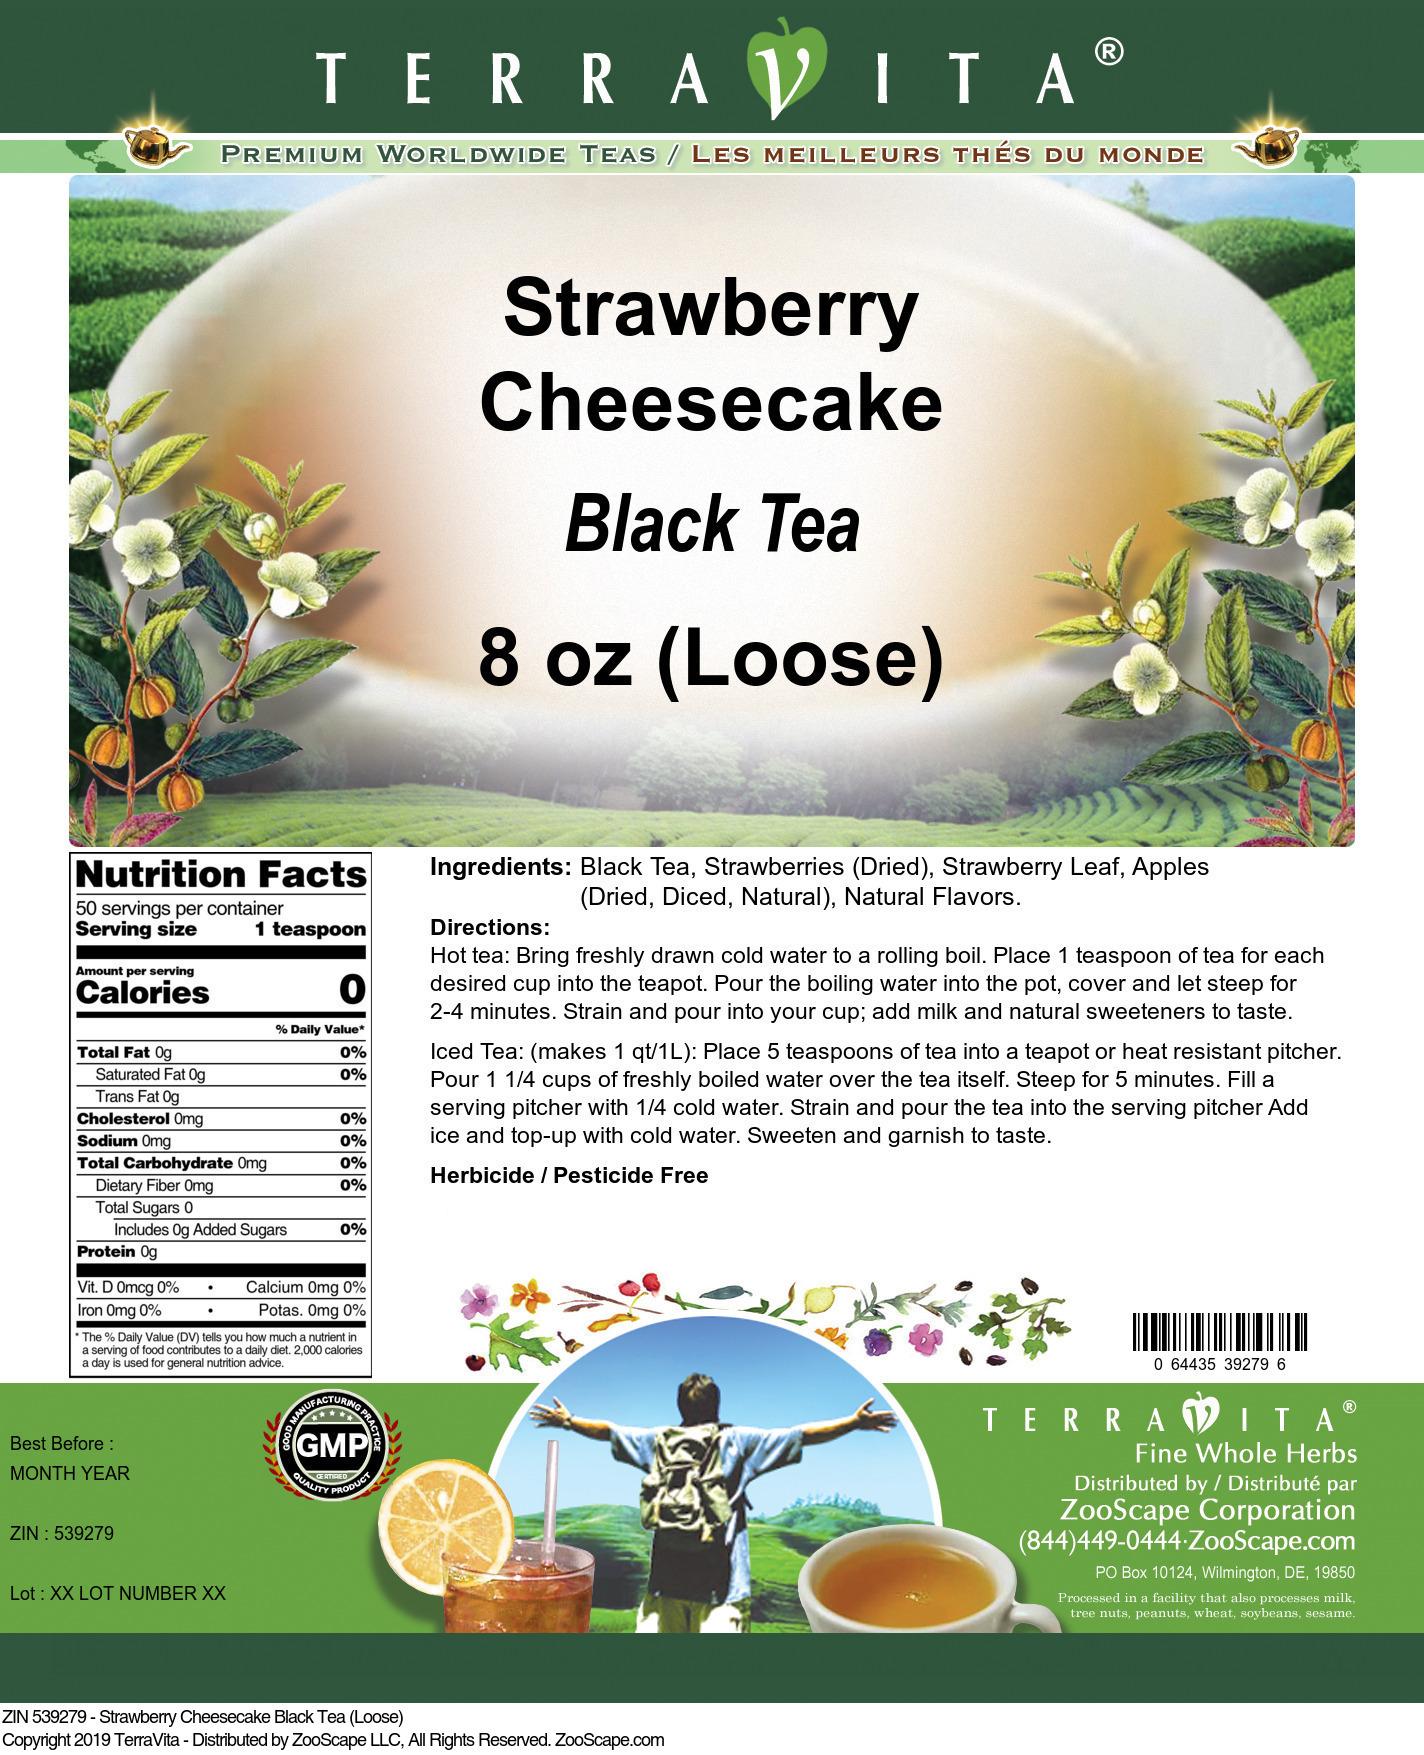 Strawberry Cheesecake Black Tea (Loose)